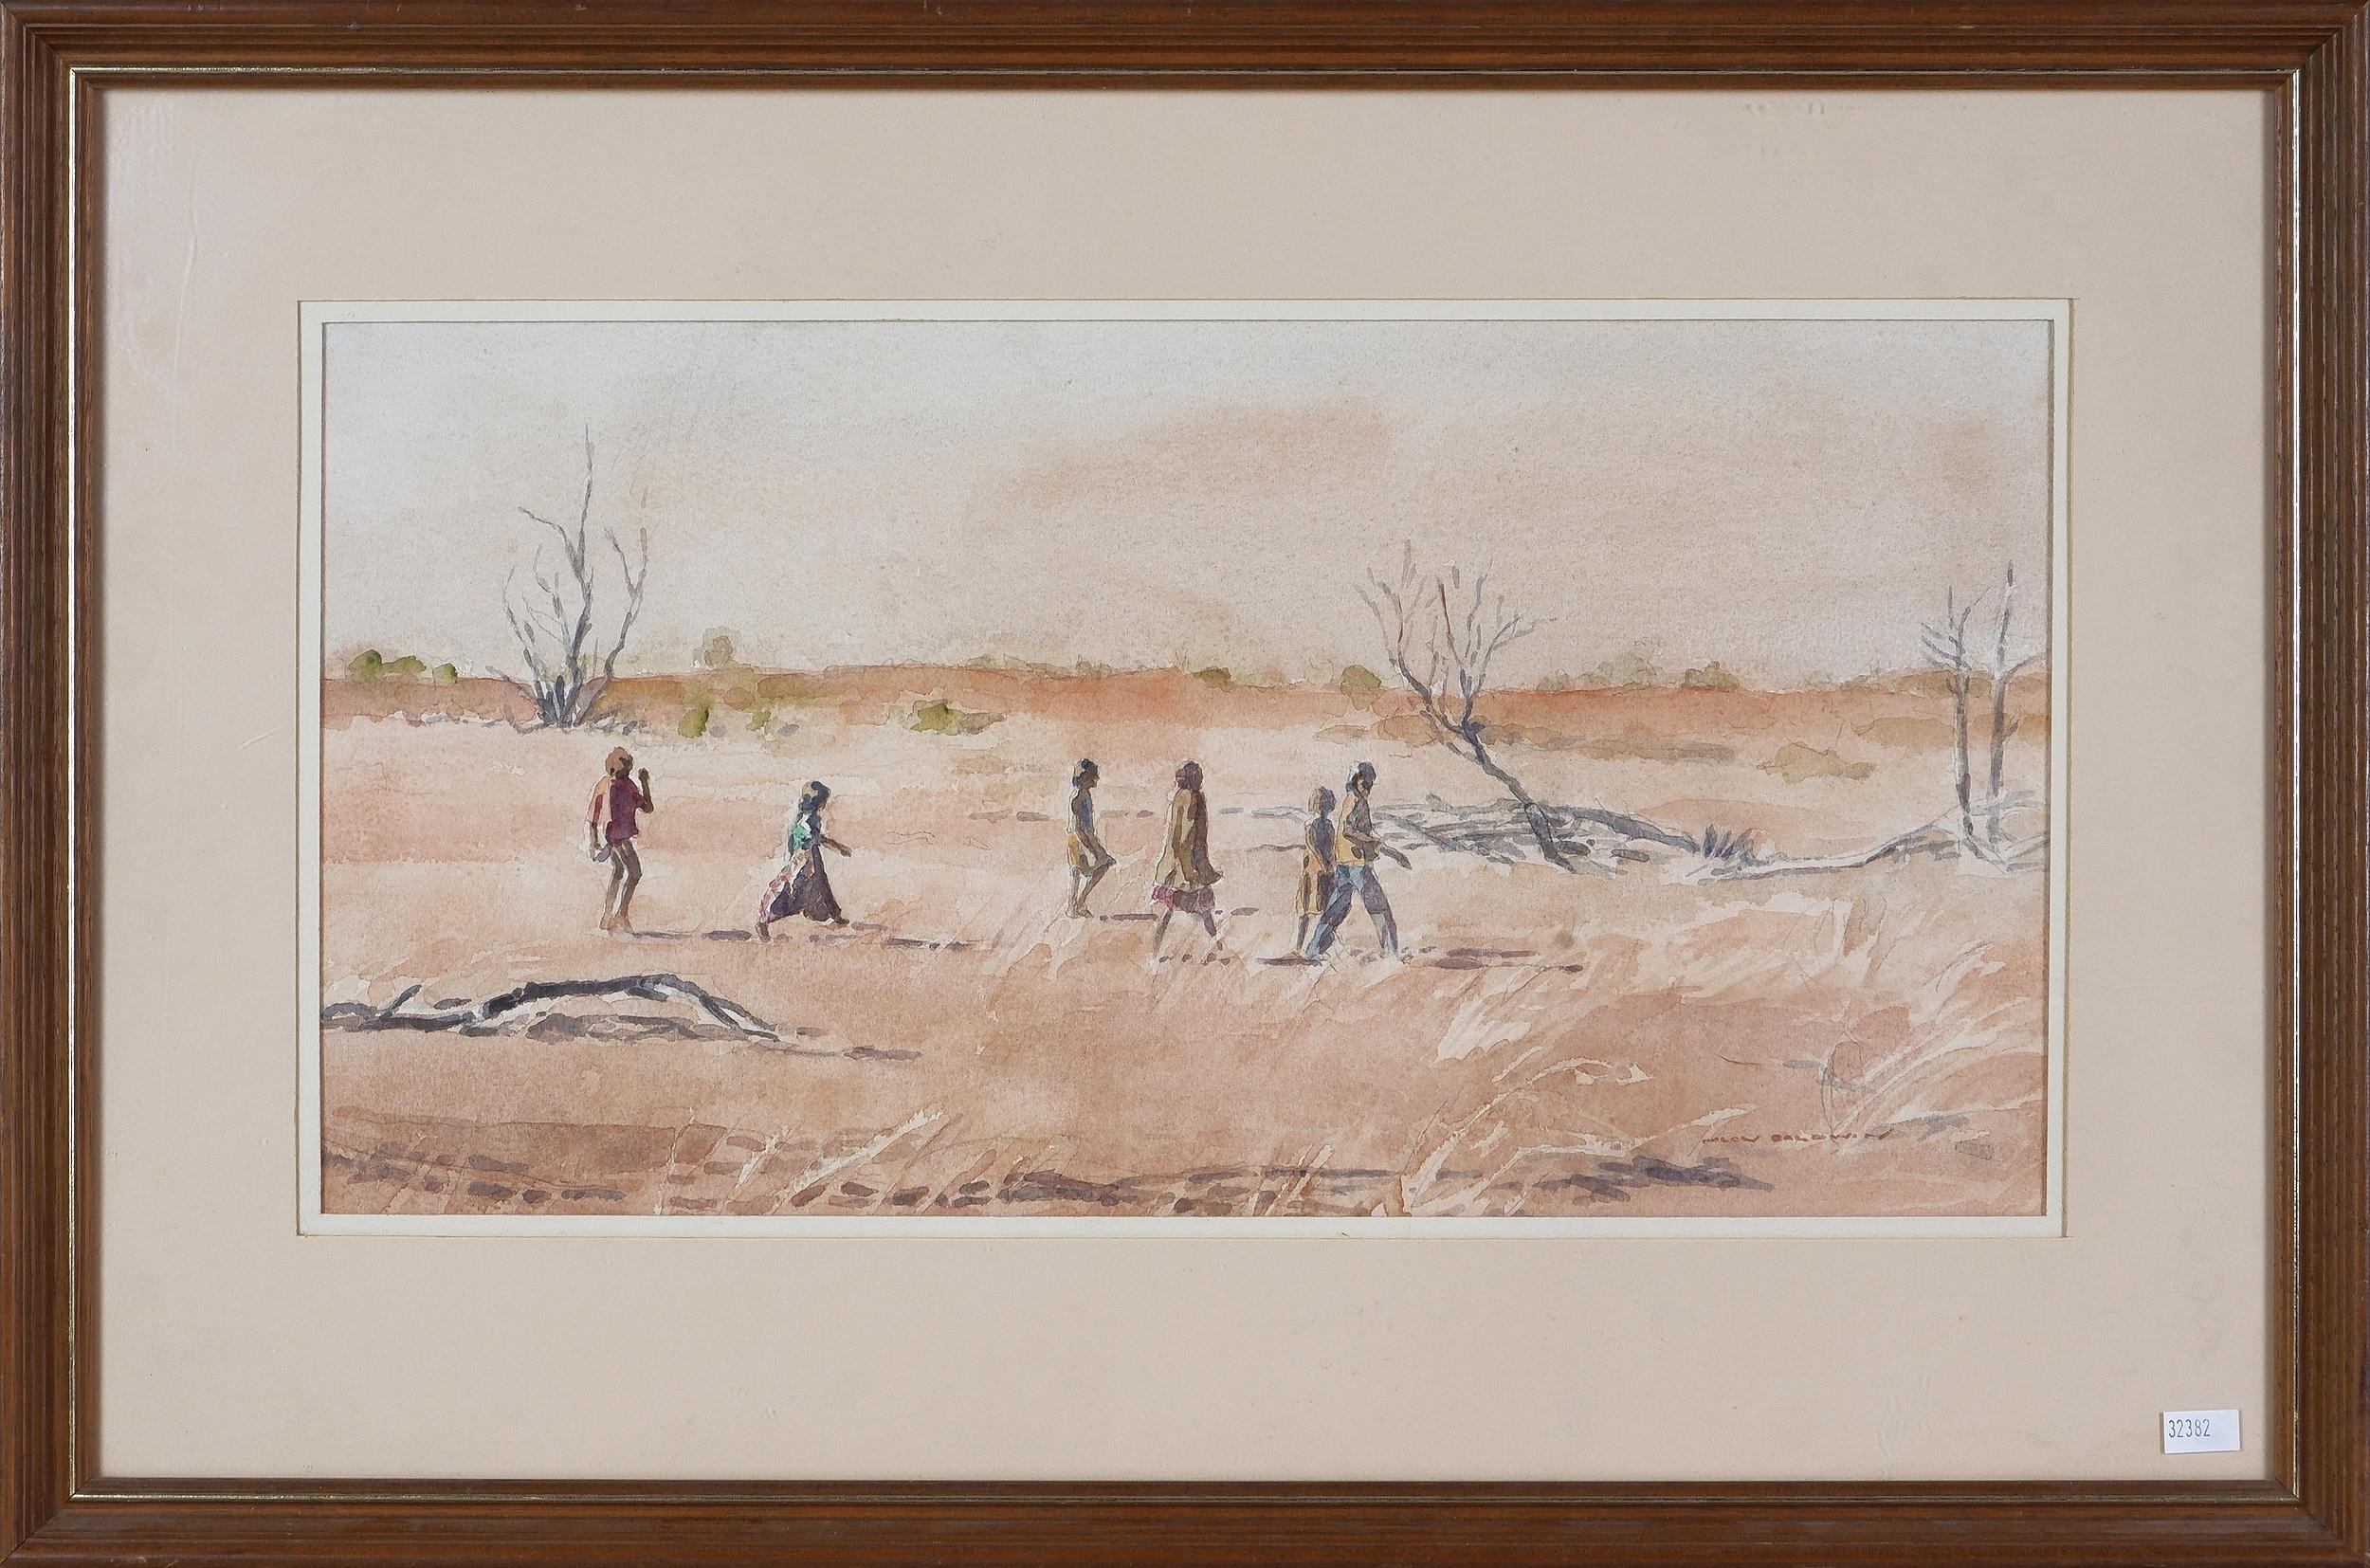 'Helen Baldwin (1912-2016), To Dashwood Creek, Children From Mount Bungara in Search of Bush Tucker (Luritja Tribe), Watercolour'